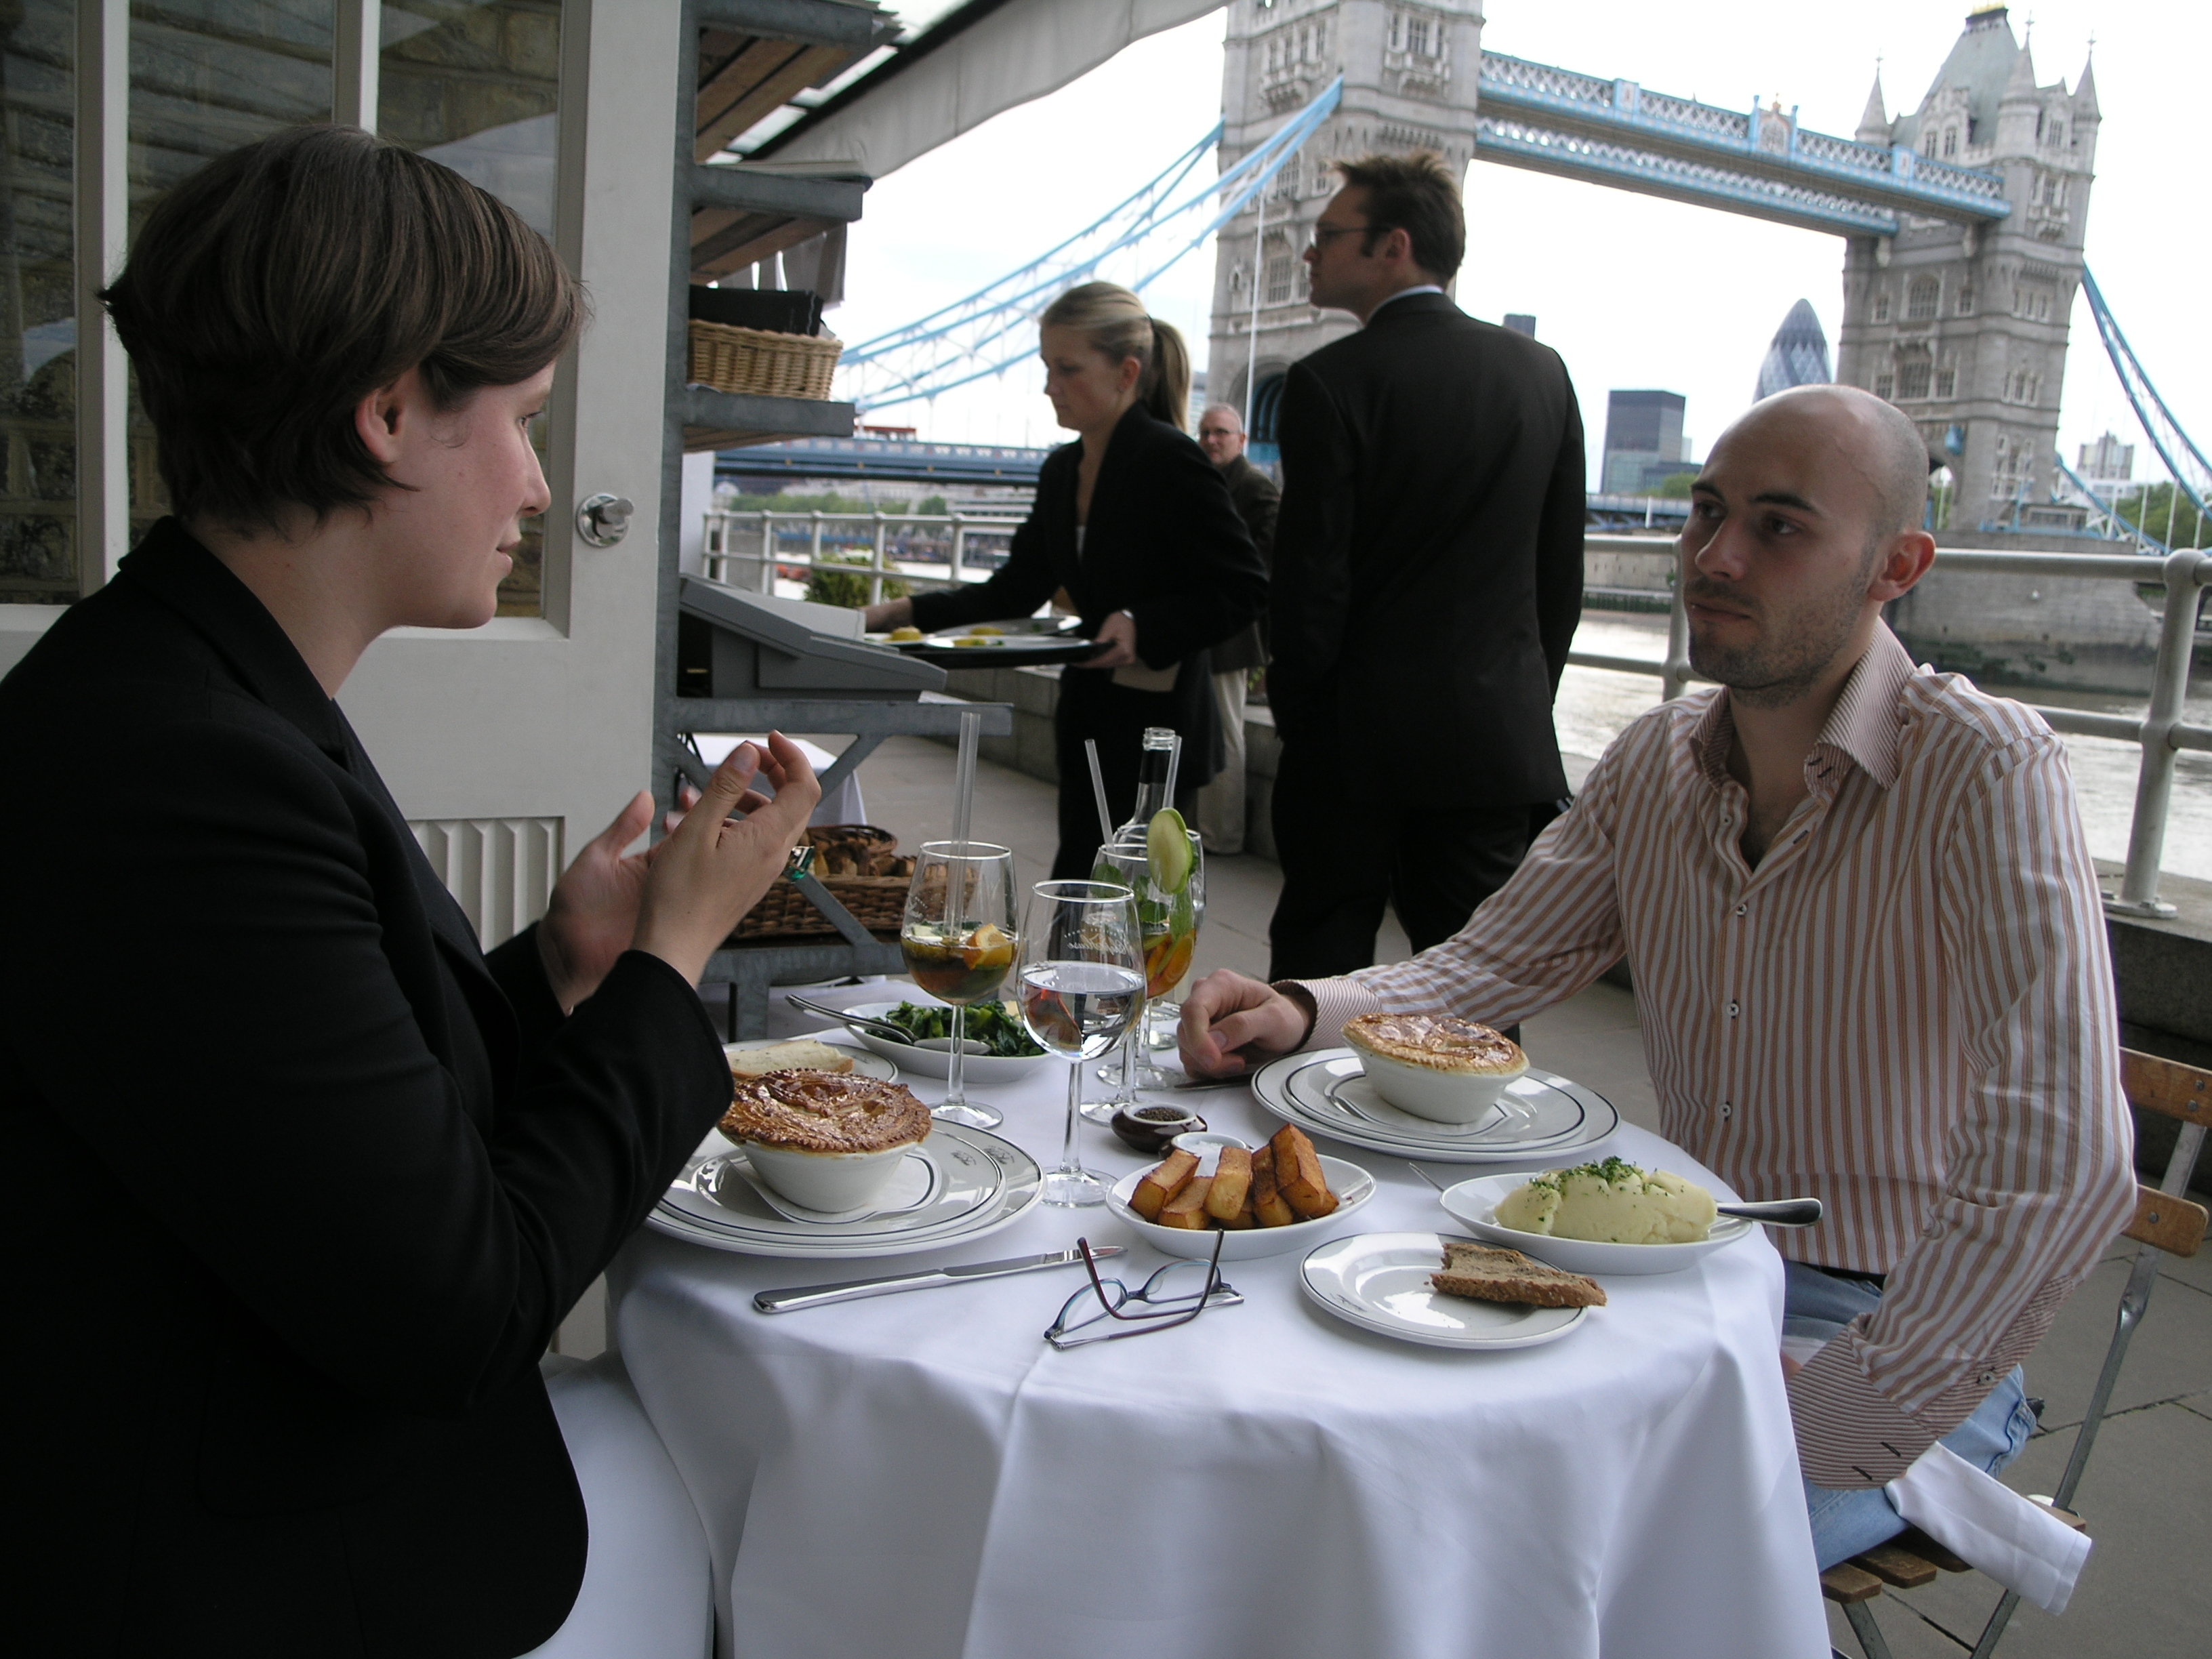 london may 2005-061.jpg